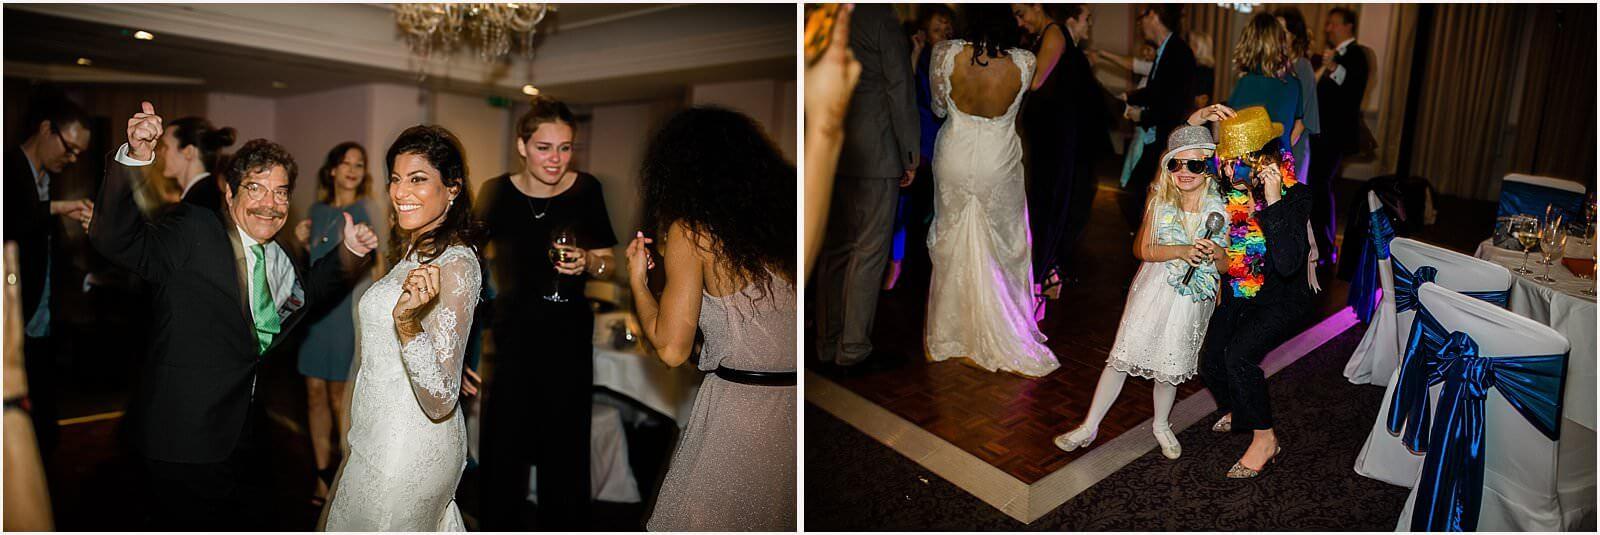 Woodlands Park Hotel Wedding   Anisa & Tristan 60